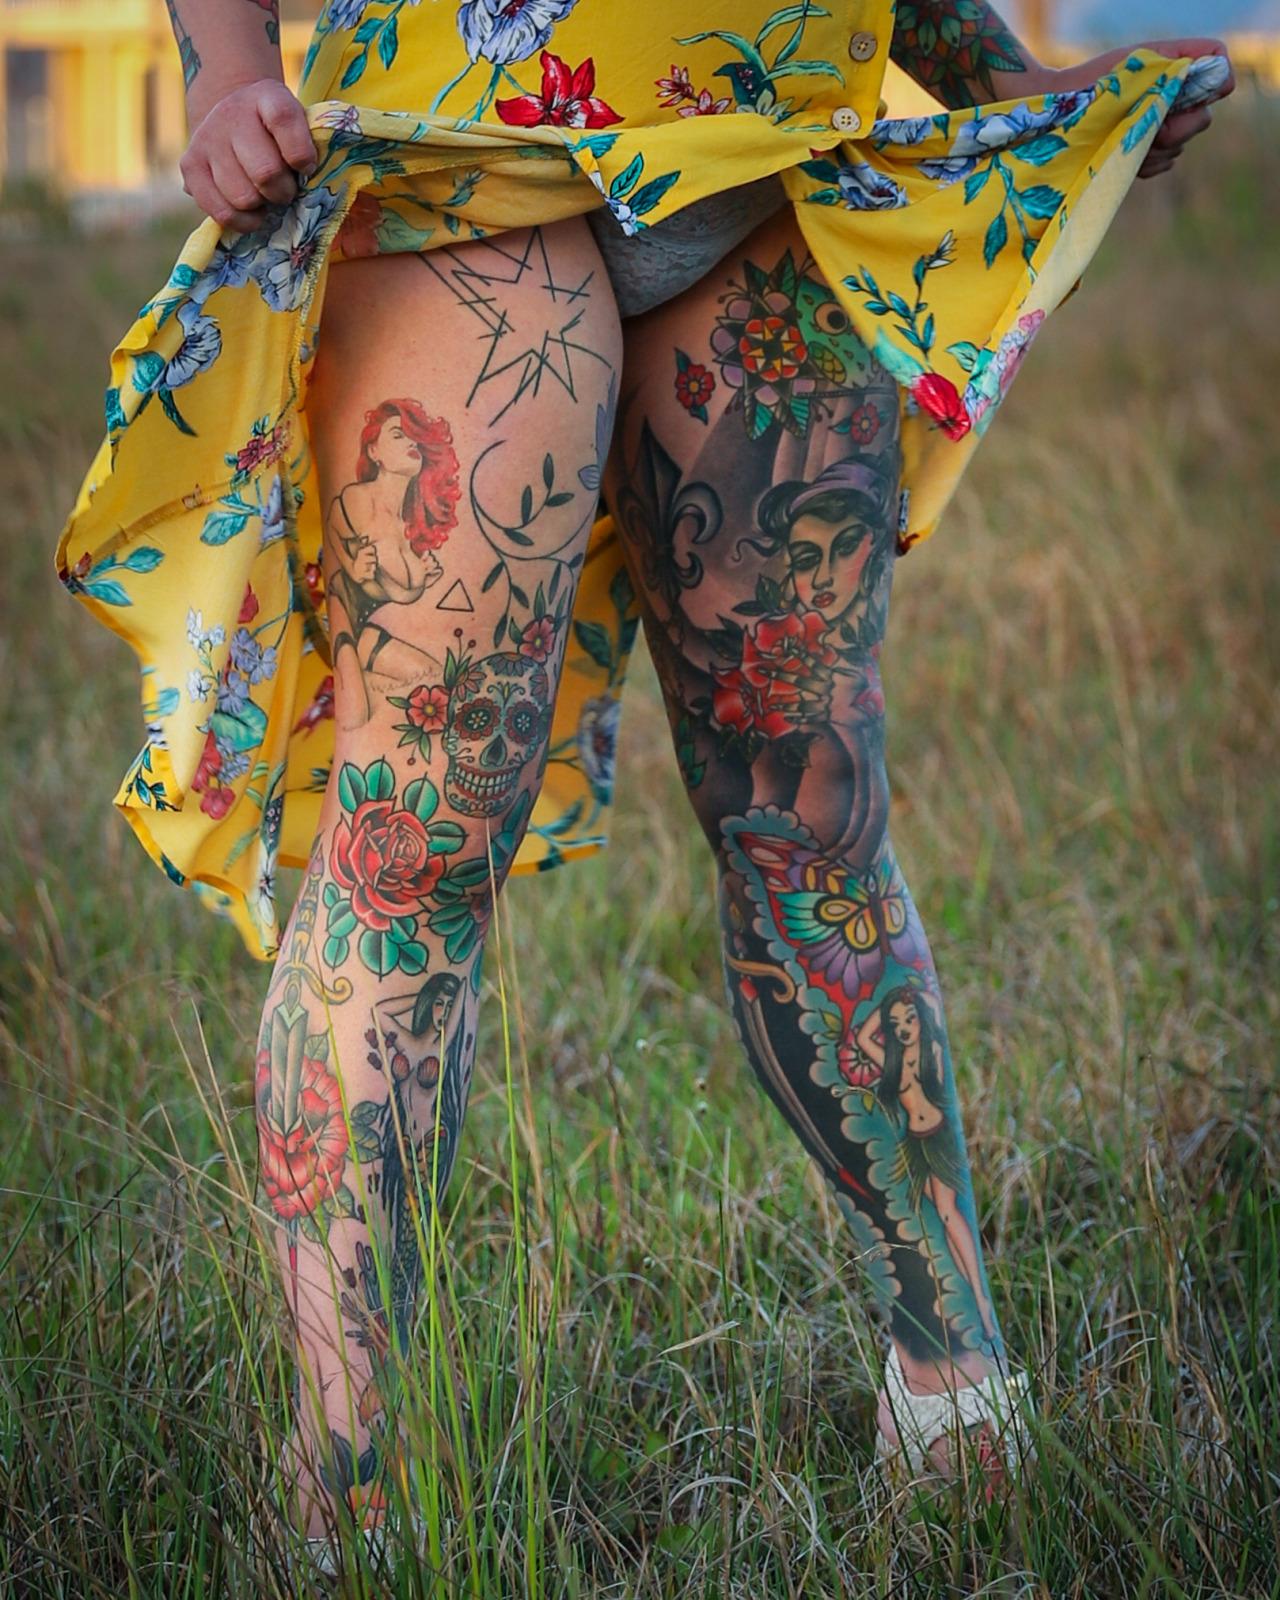 Tattooed Legs #tattooed legs#tattooedlegs#leg tattoos#legtattoos#inked legs#inkedlegs#inked up#tattooed#traditional tattoos#tattoos#heavily tatttooed #heavily tattooed legs #shocking tattoos